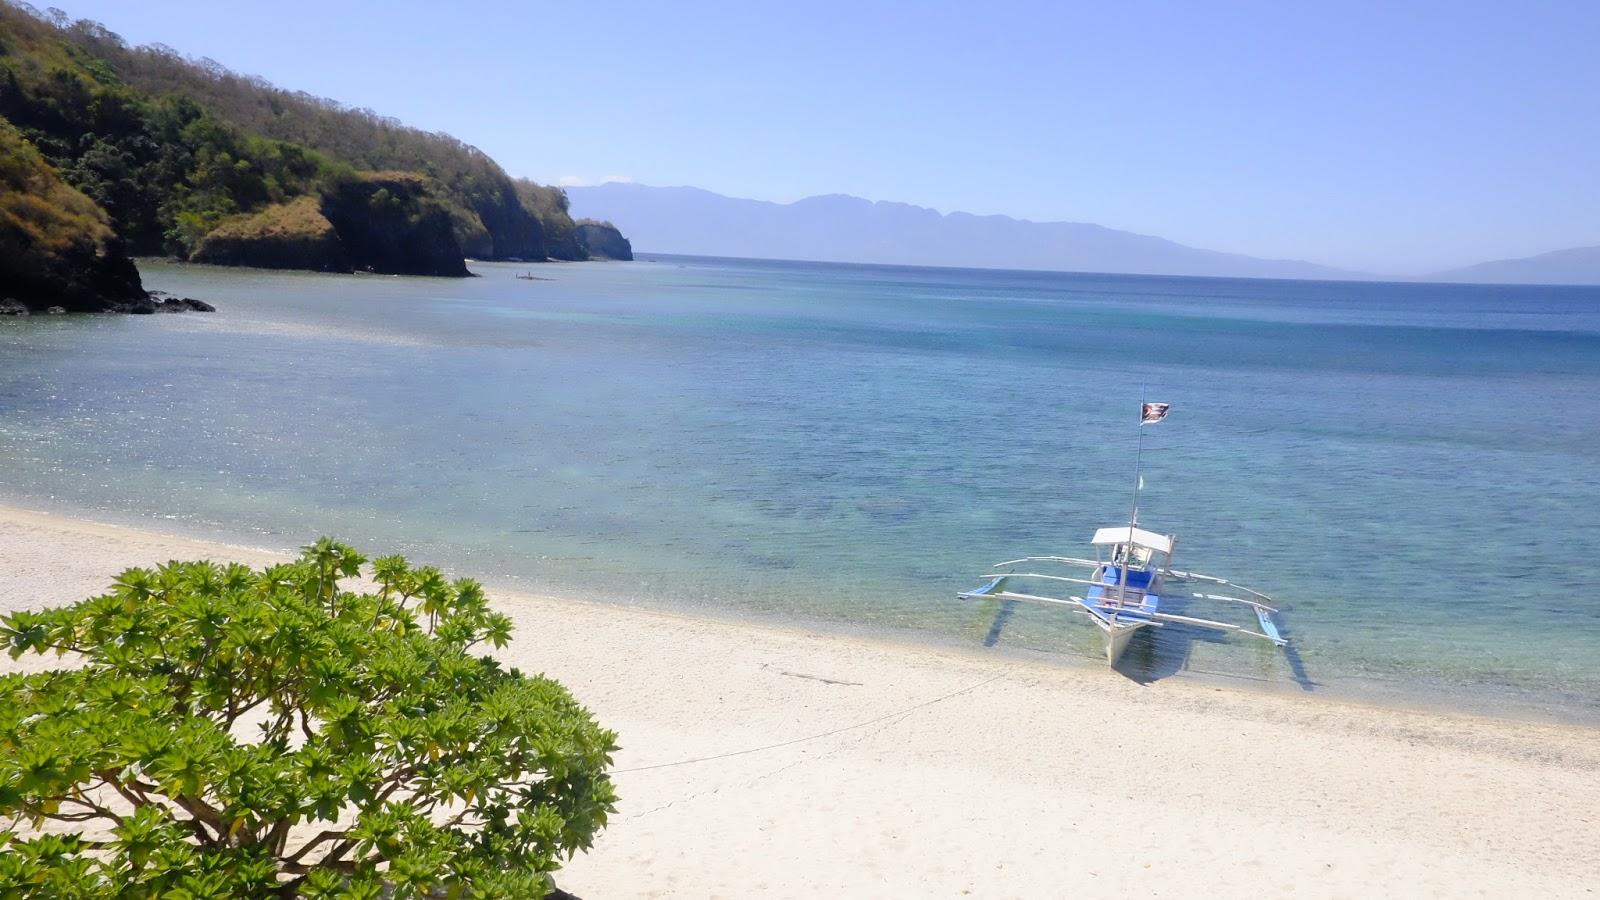 Sepoc Island's white beach sand